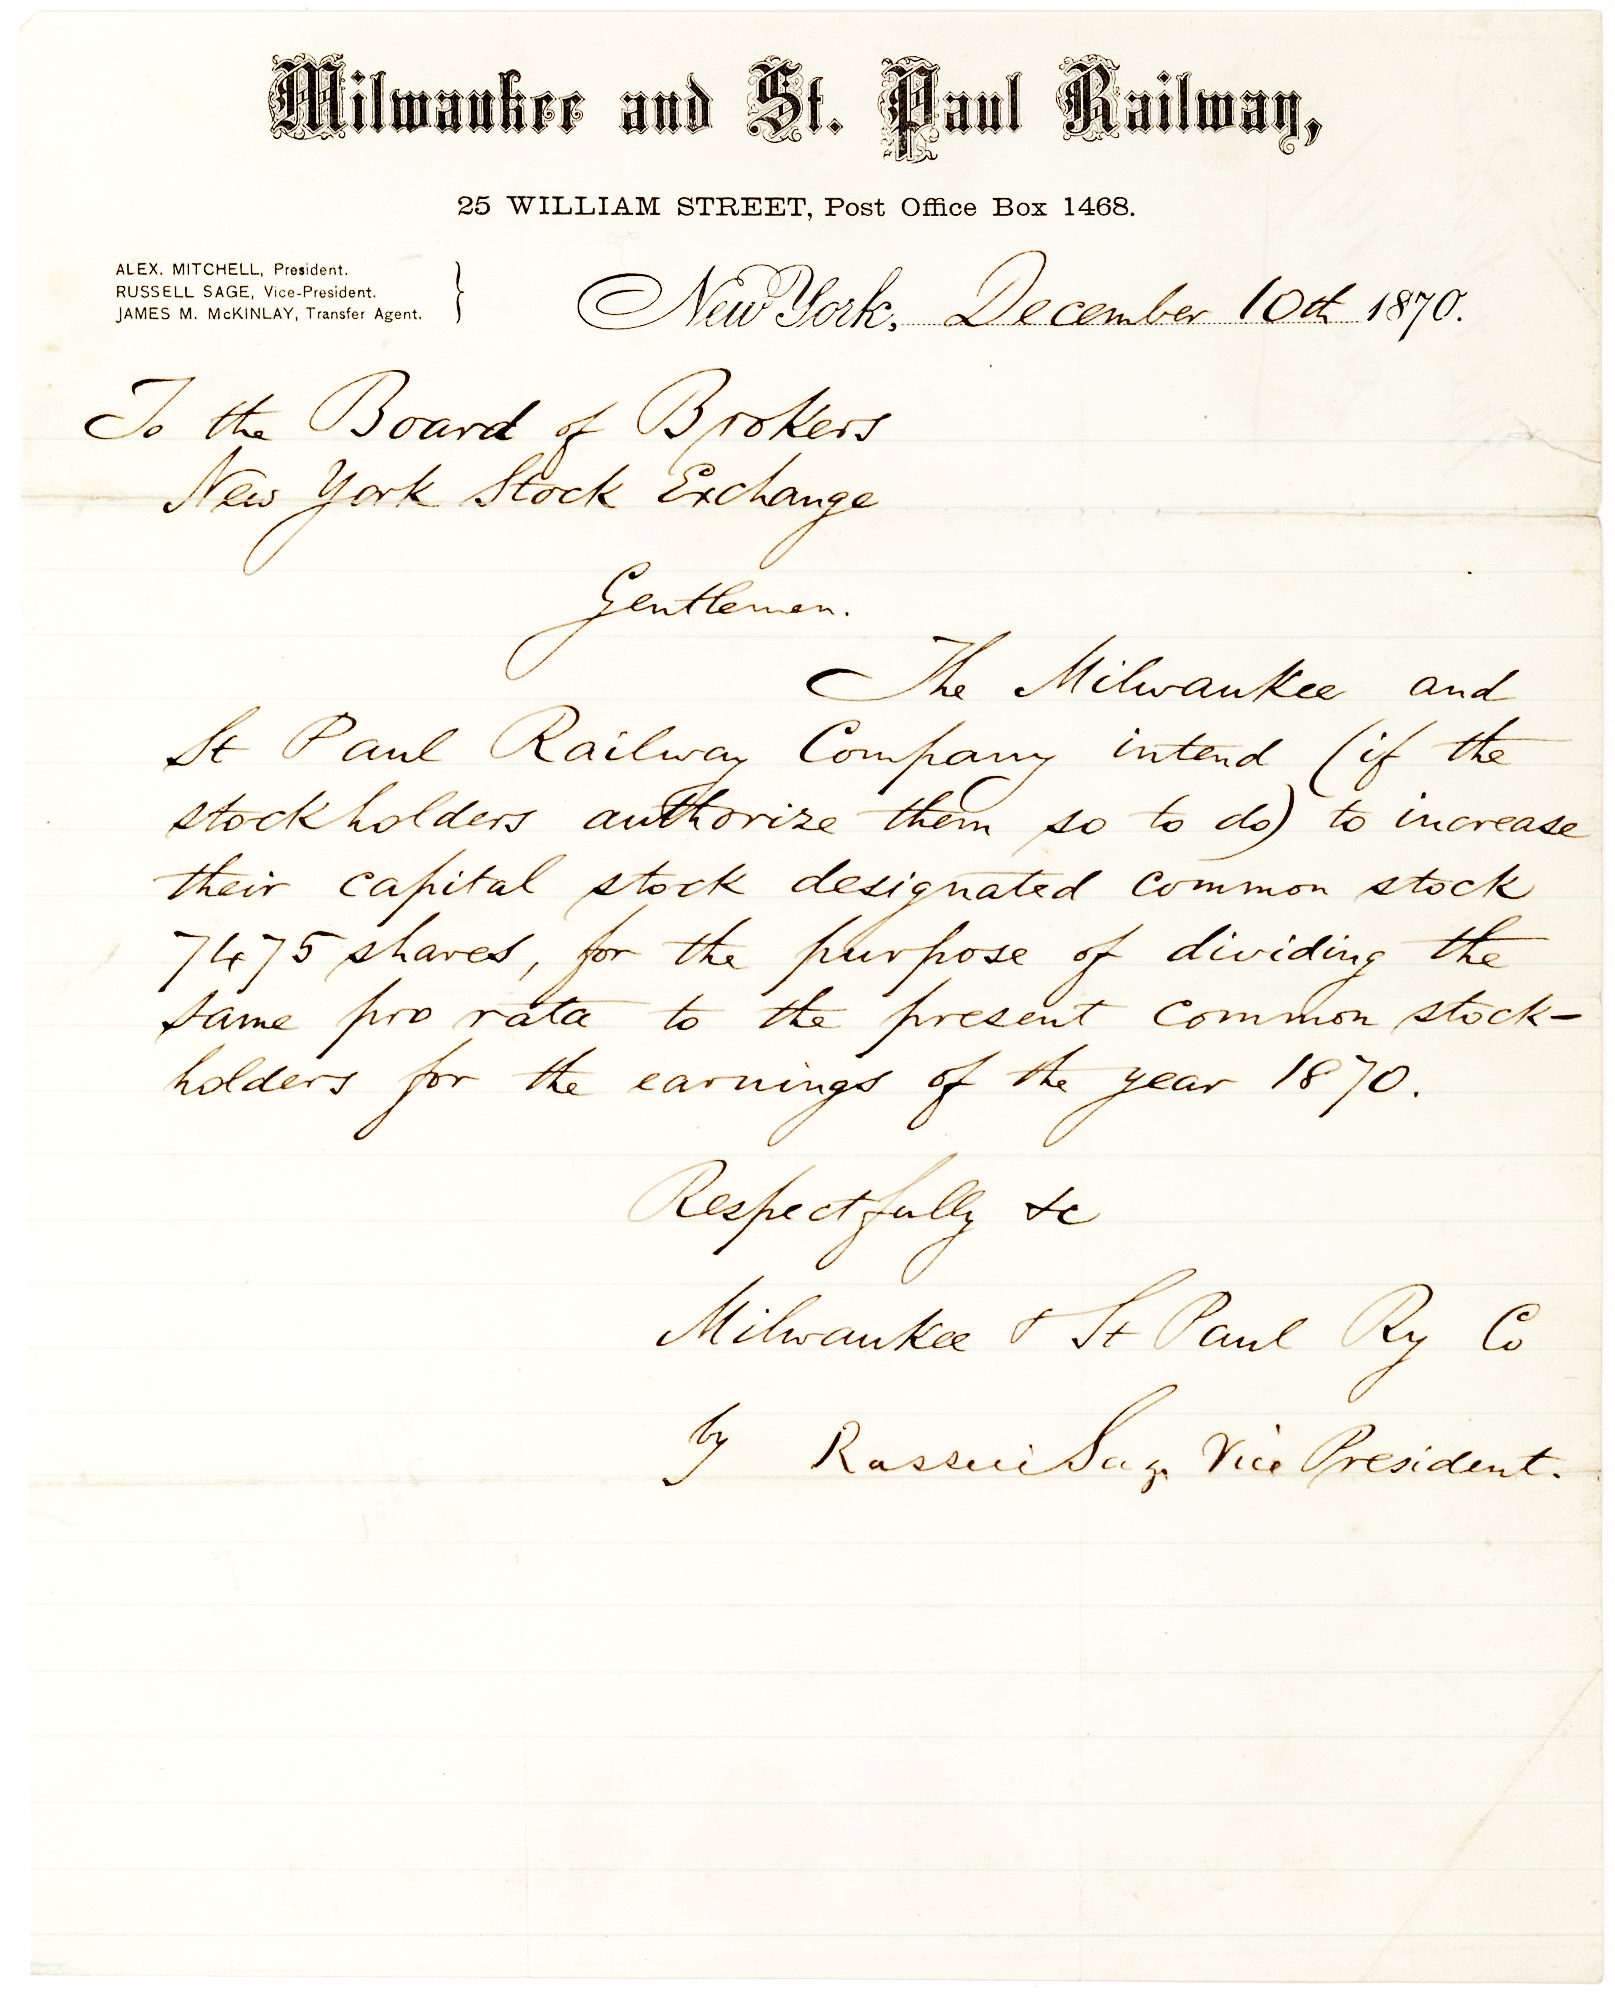 Railroad Mogul Writes to the New York Stock Exchange